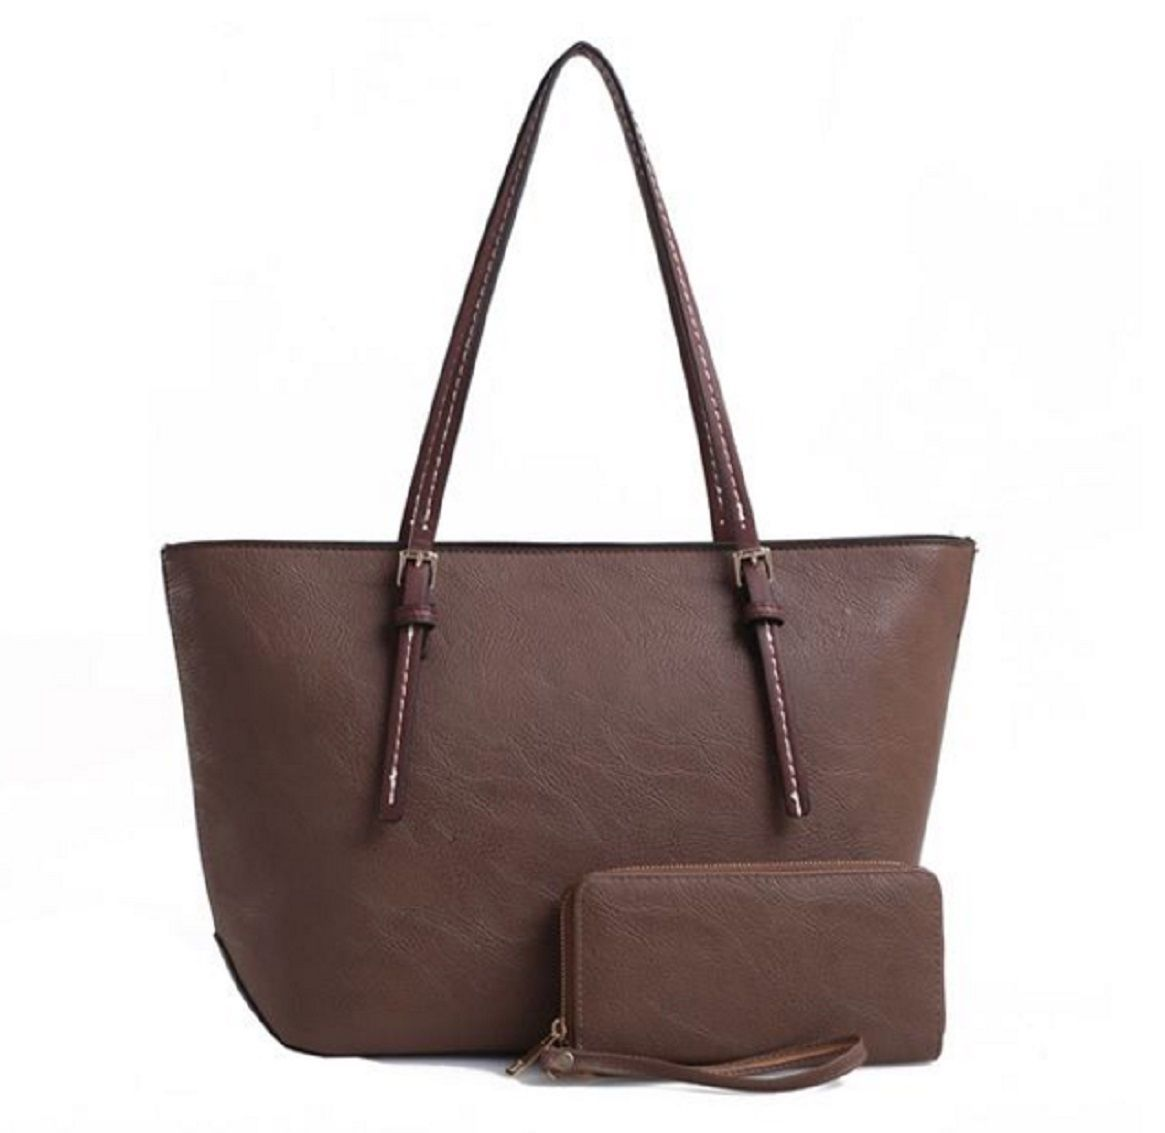 ca974f03c6 Emperia Bag  2 customer reviews and 9 listings